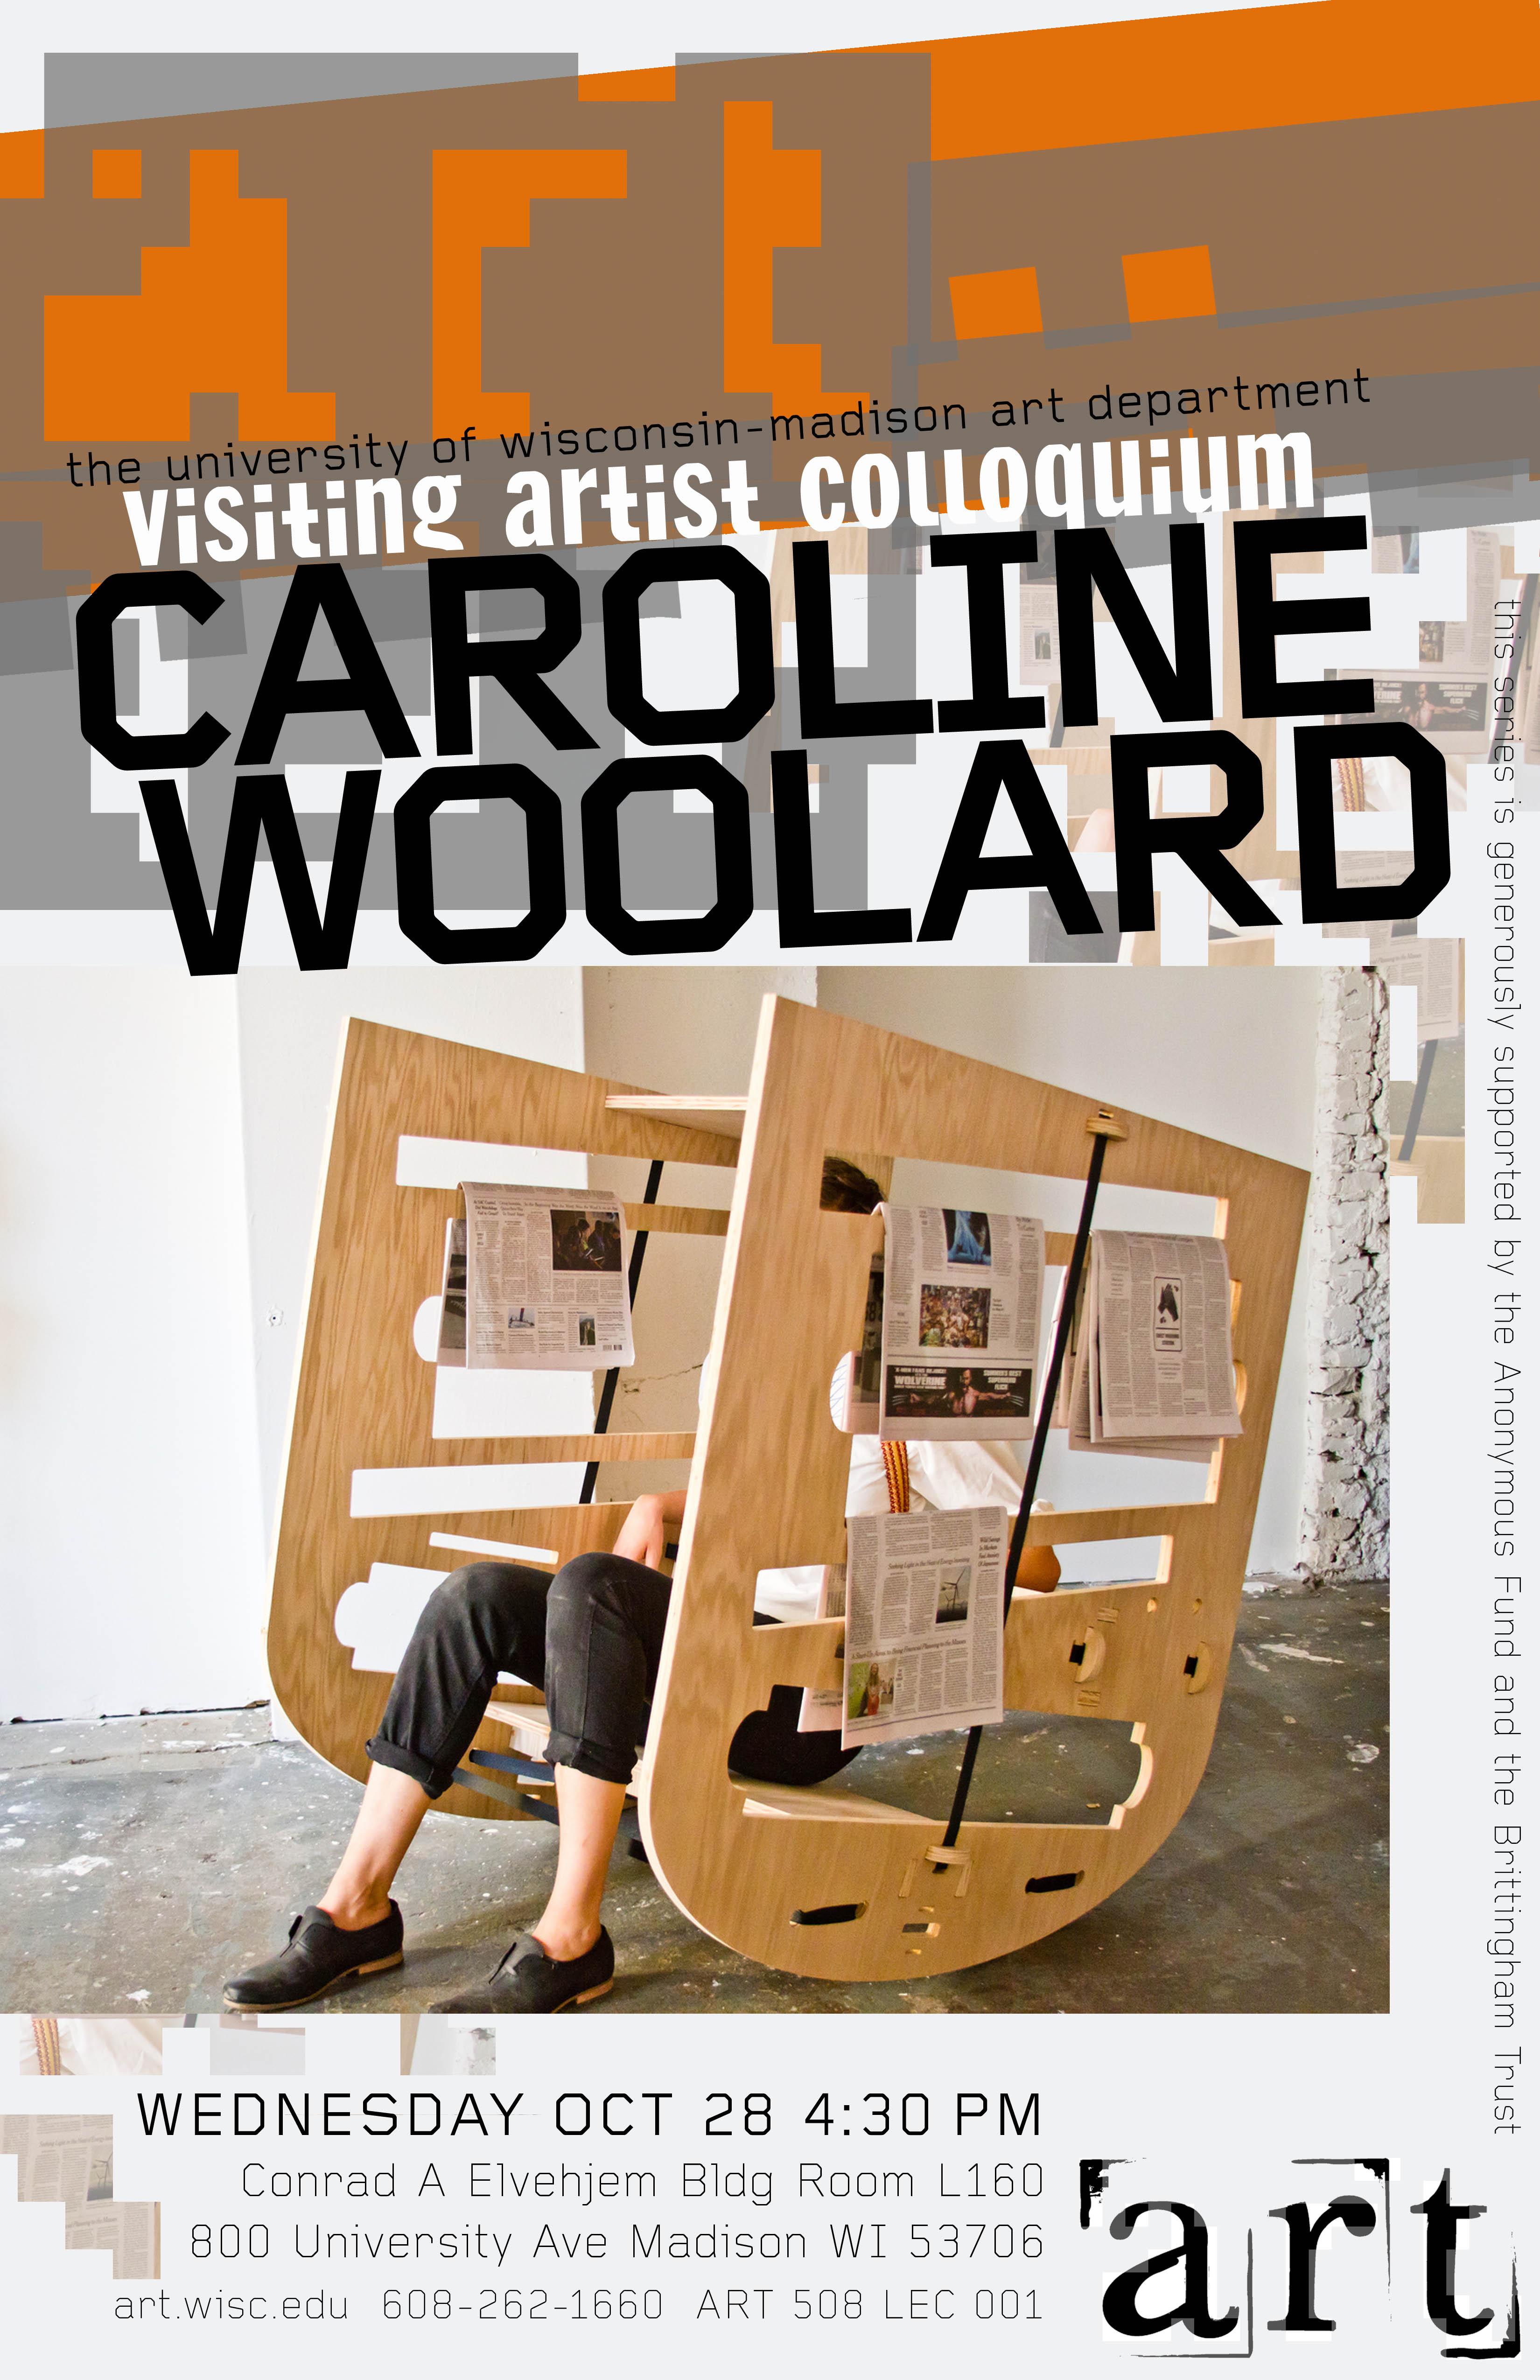 Poster 9 Caroline Woolard